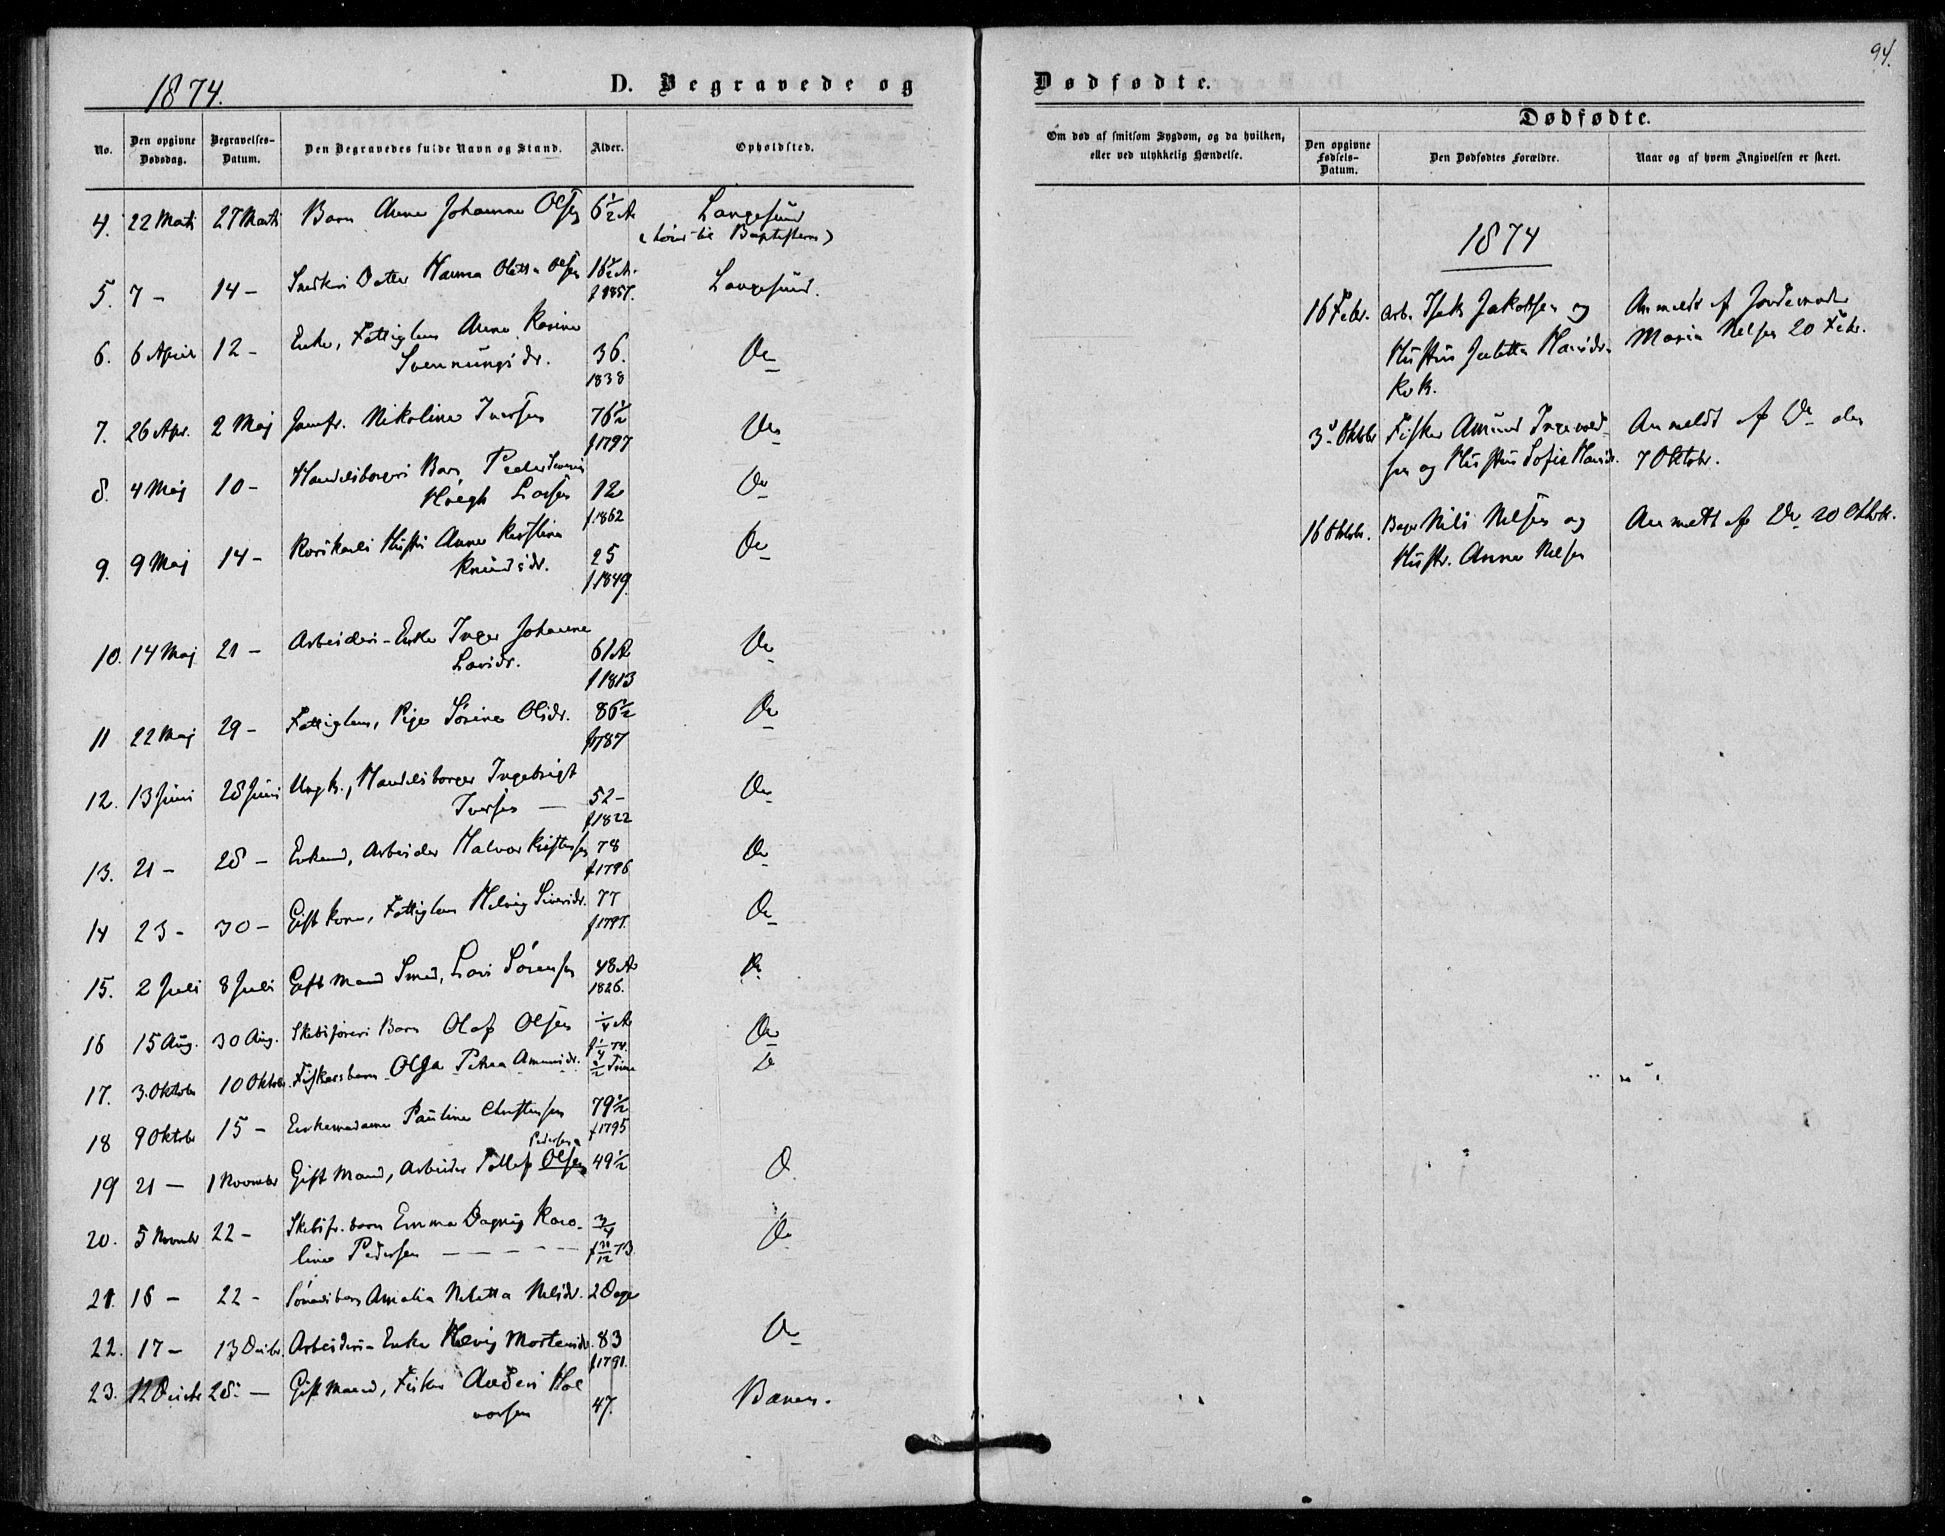 SAKO, Langesund kirkebøker, F/Fa/L0001: Ministerialbok nr. 1, 1870-1877, s. 94